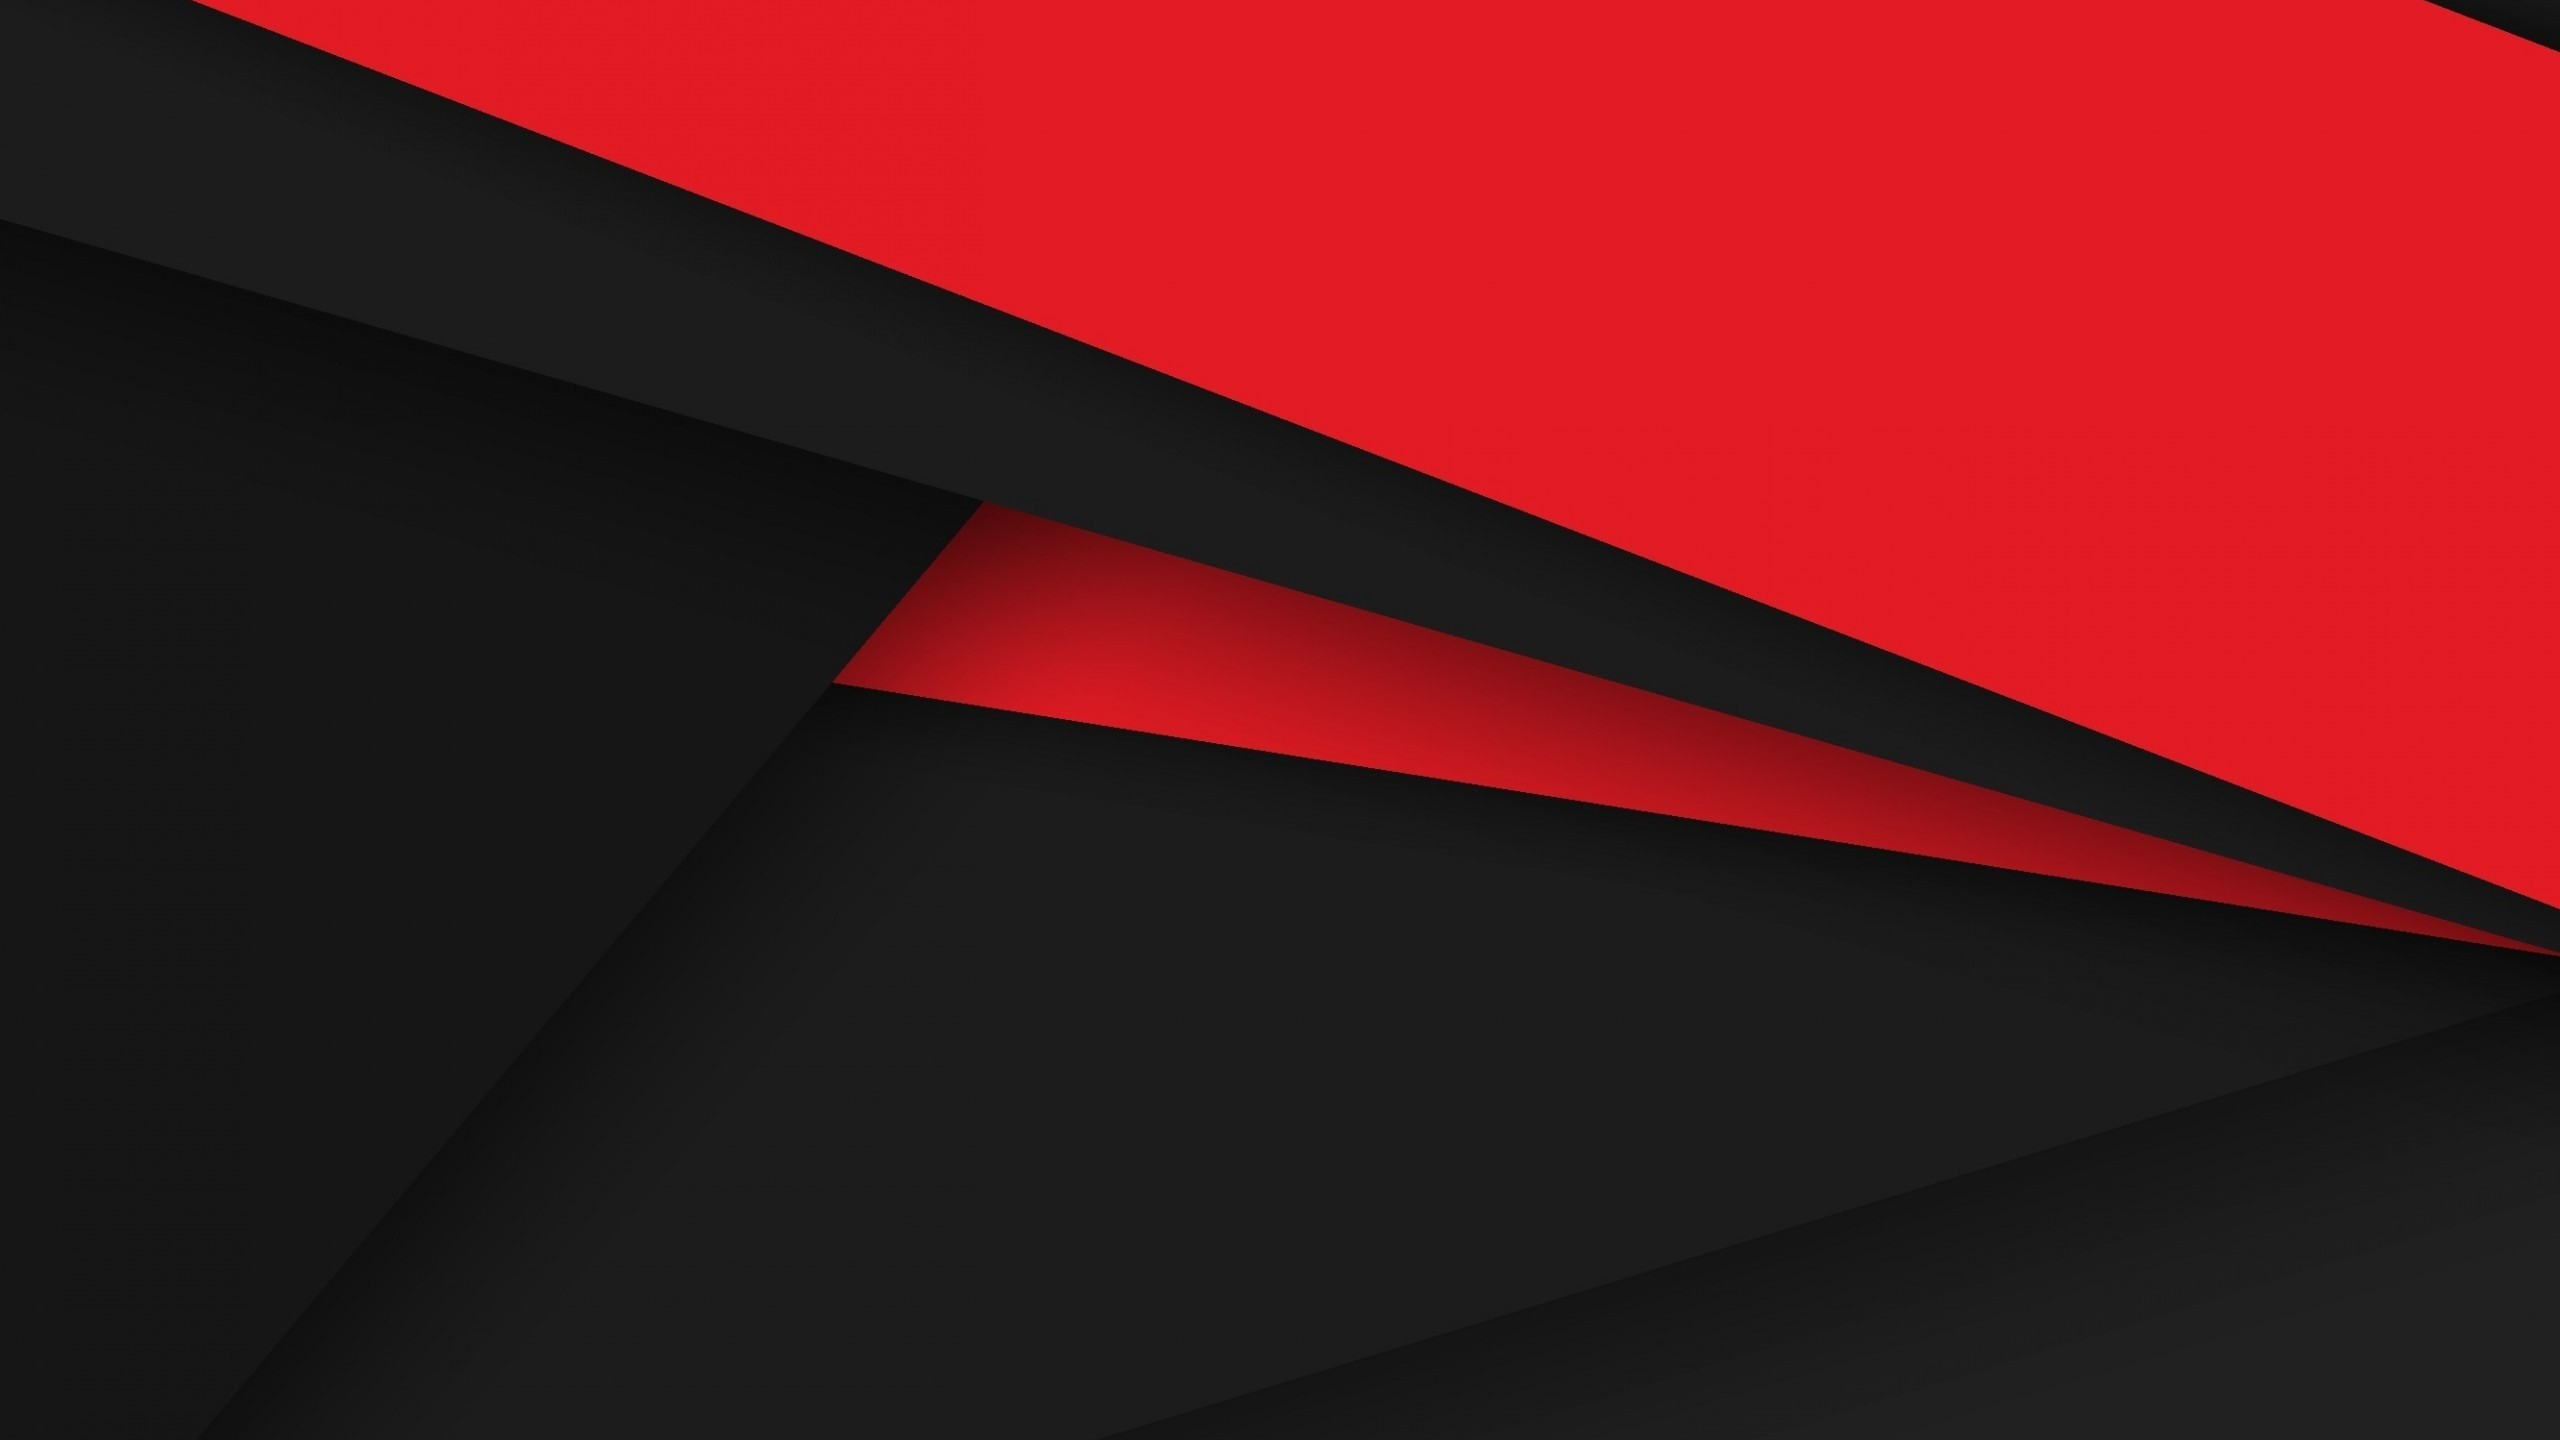 Red-black-wallpaper-photos